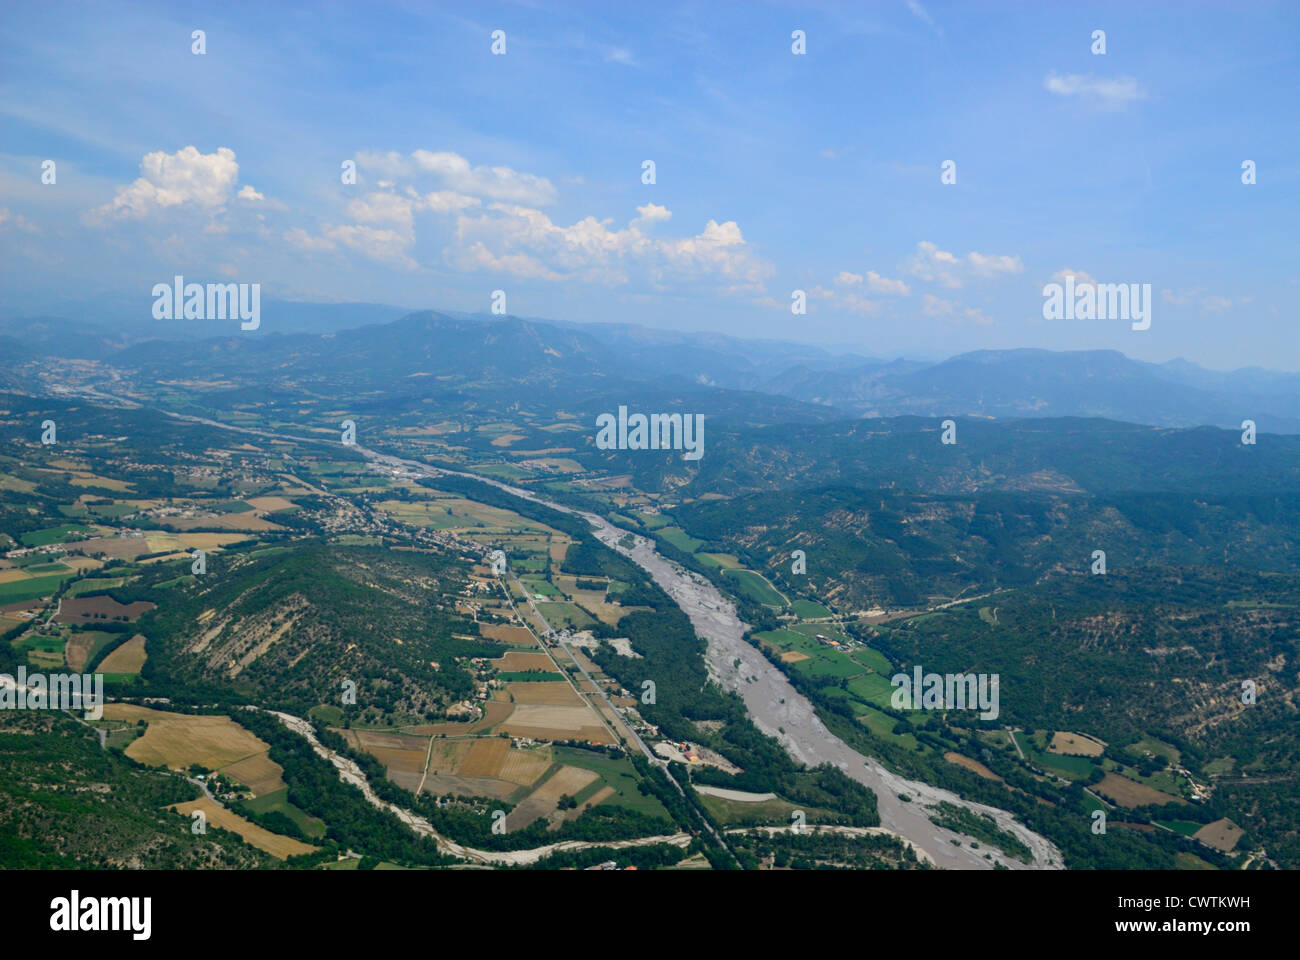 Aerial view of La Bleone valley and river near La Comerie/Mirabeau, Alpes de haute Provence, France - Stock Image